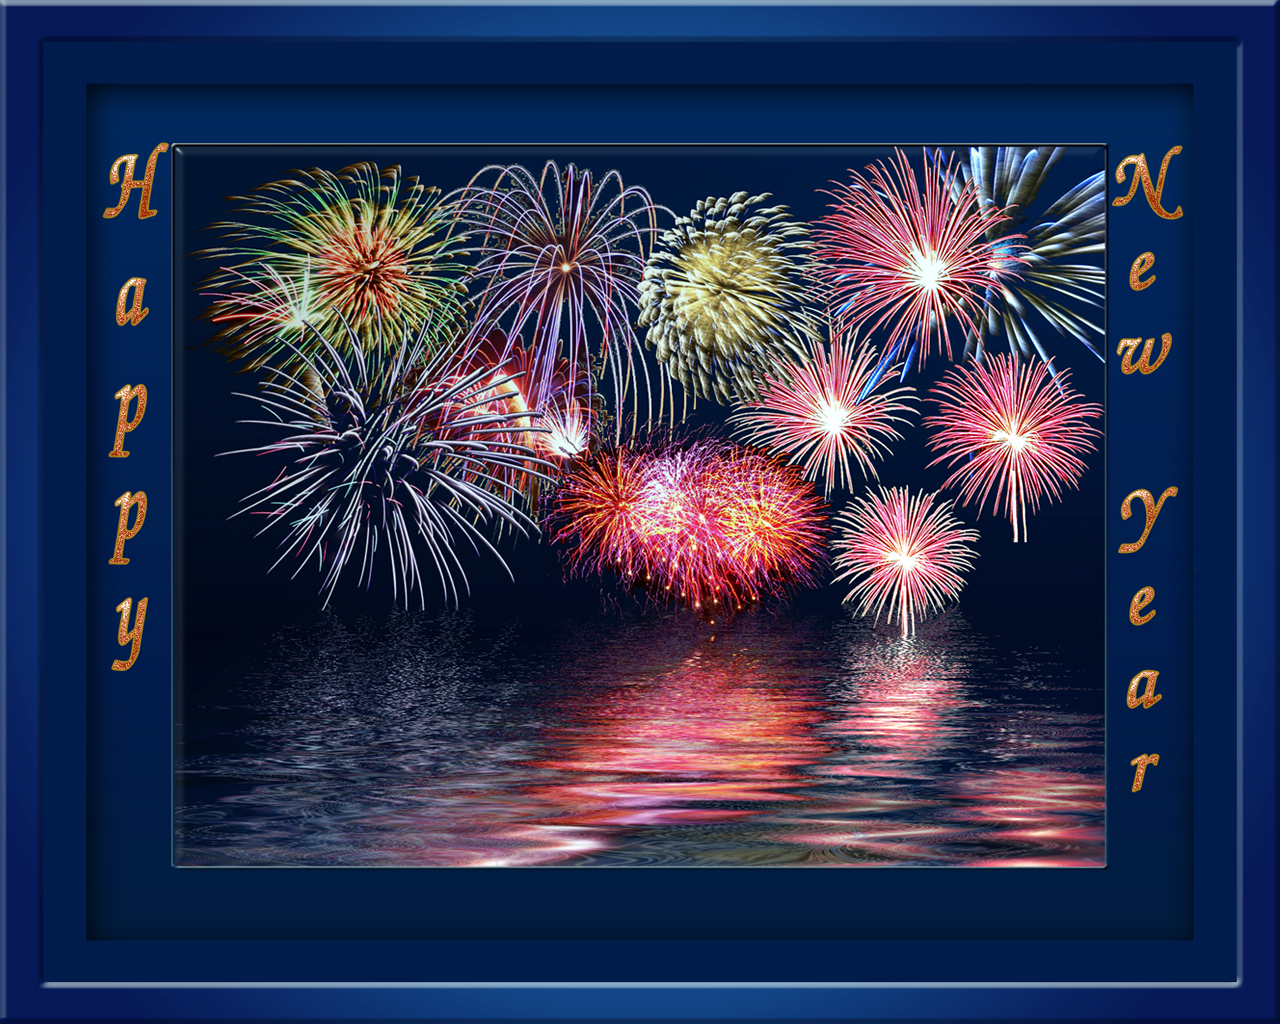 Happy New Years Wallpaper 1280x1024